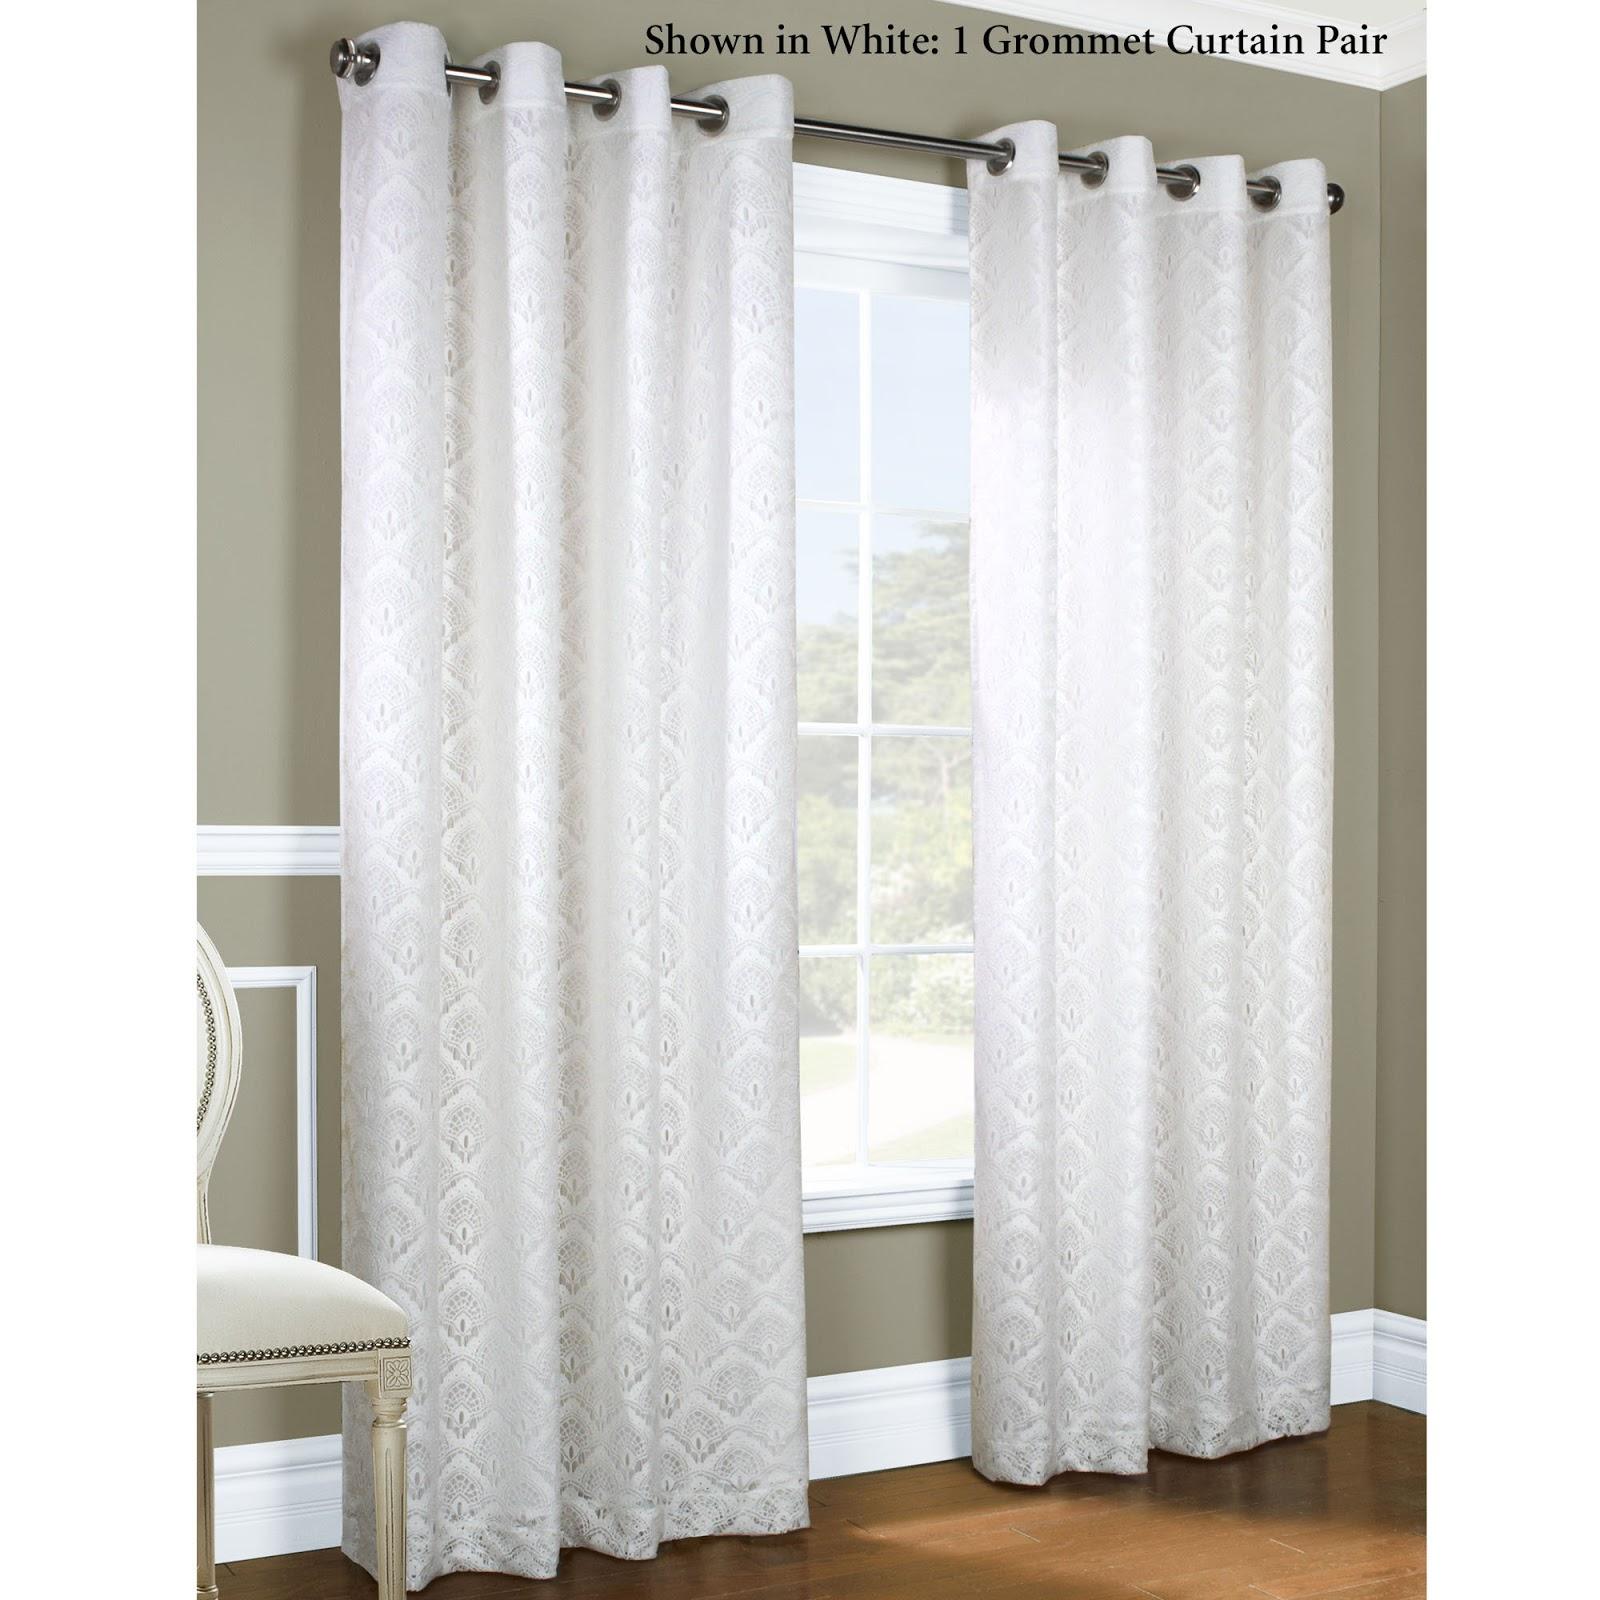 Diy Bohemian Curtains Boho Bunk Bed Burlap Shower Curtain